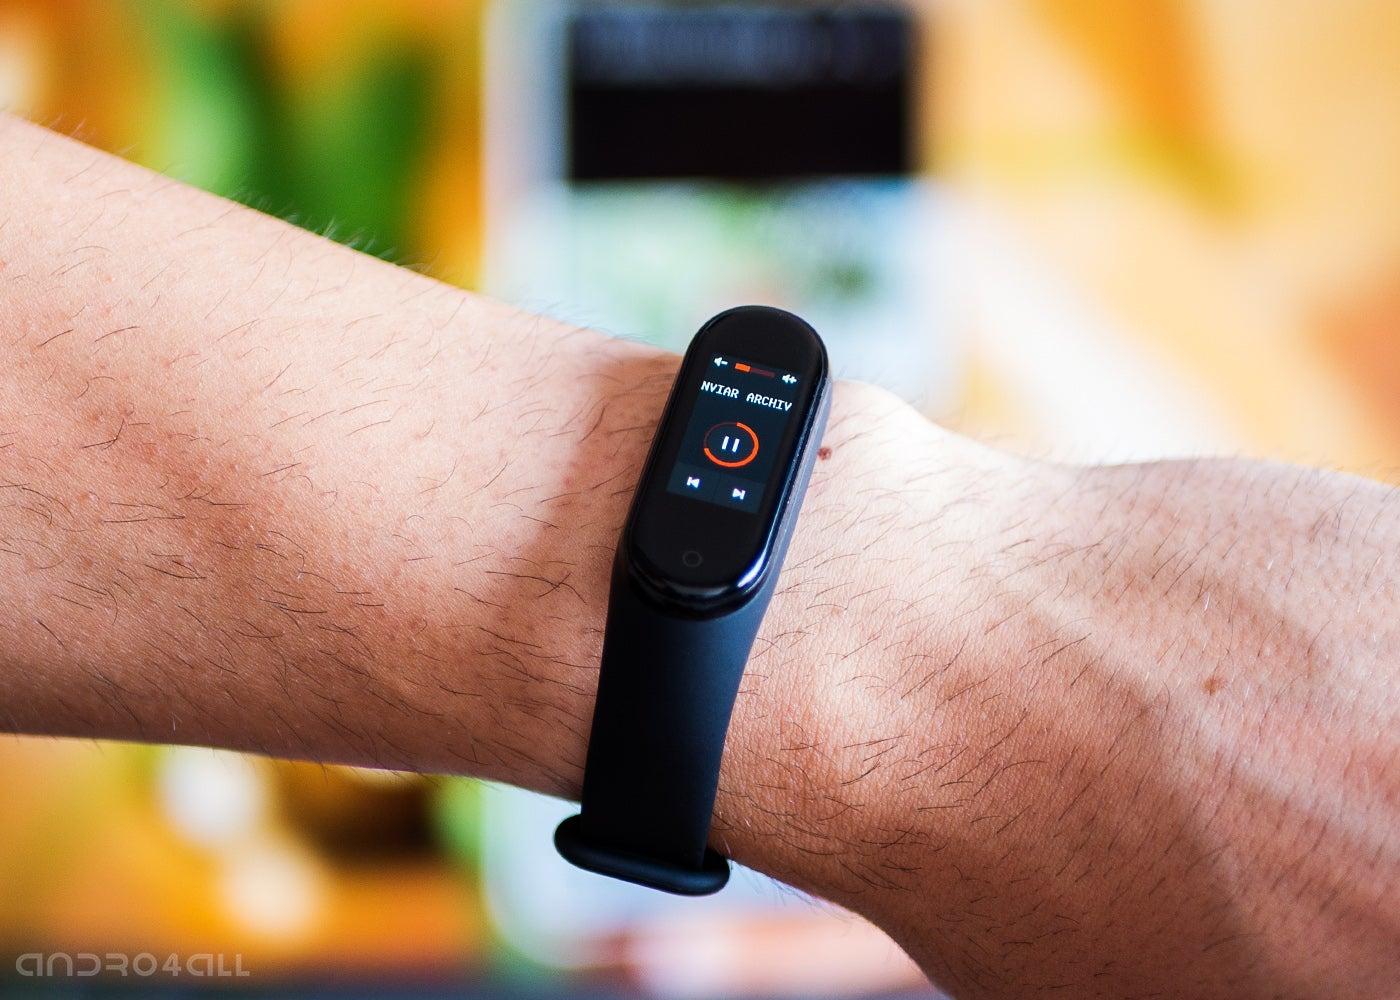 Mi Band 4, control Chromecast or Smart TV content